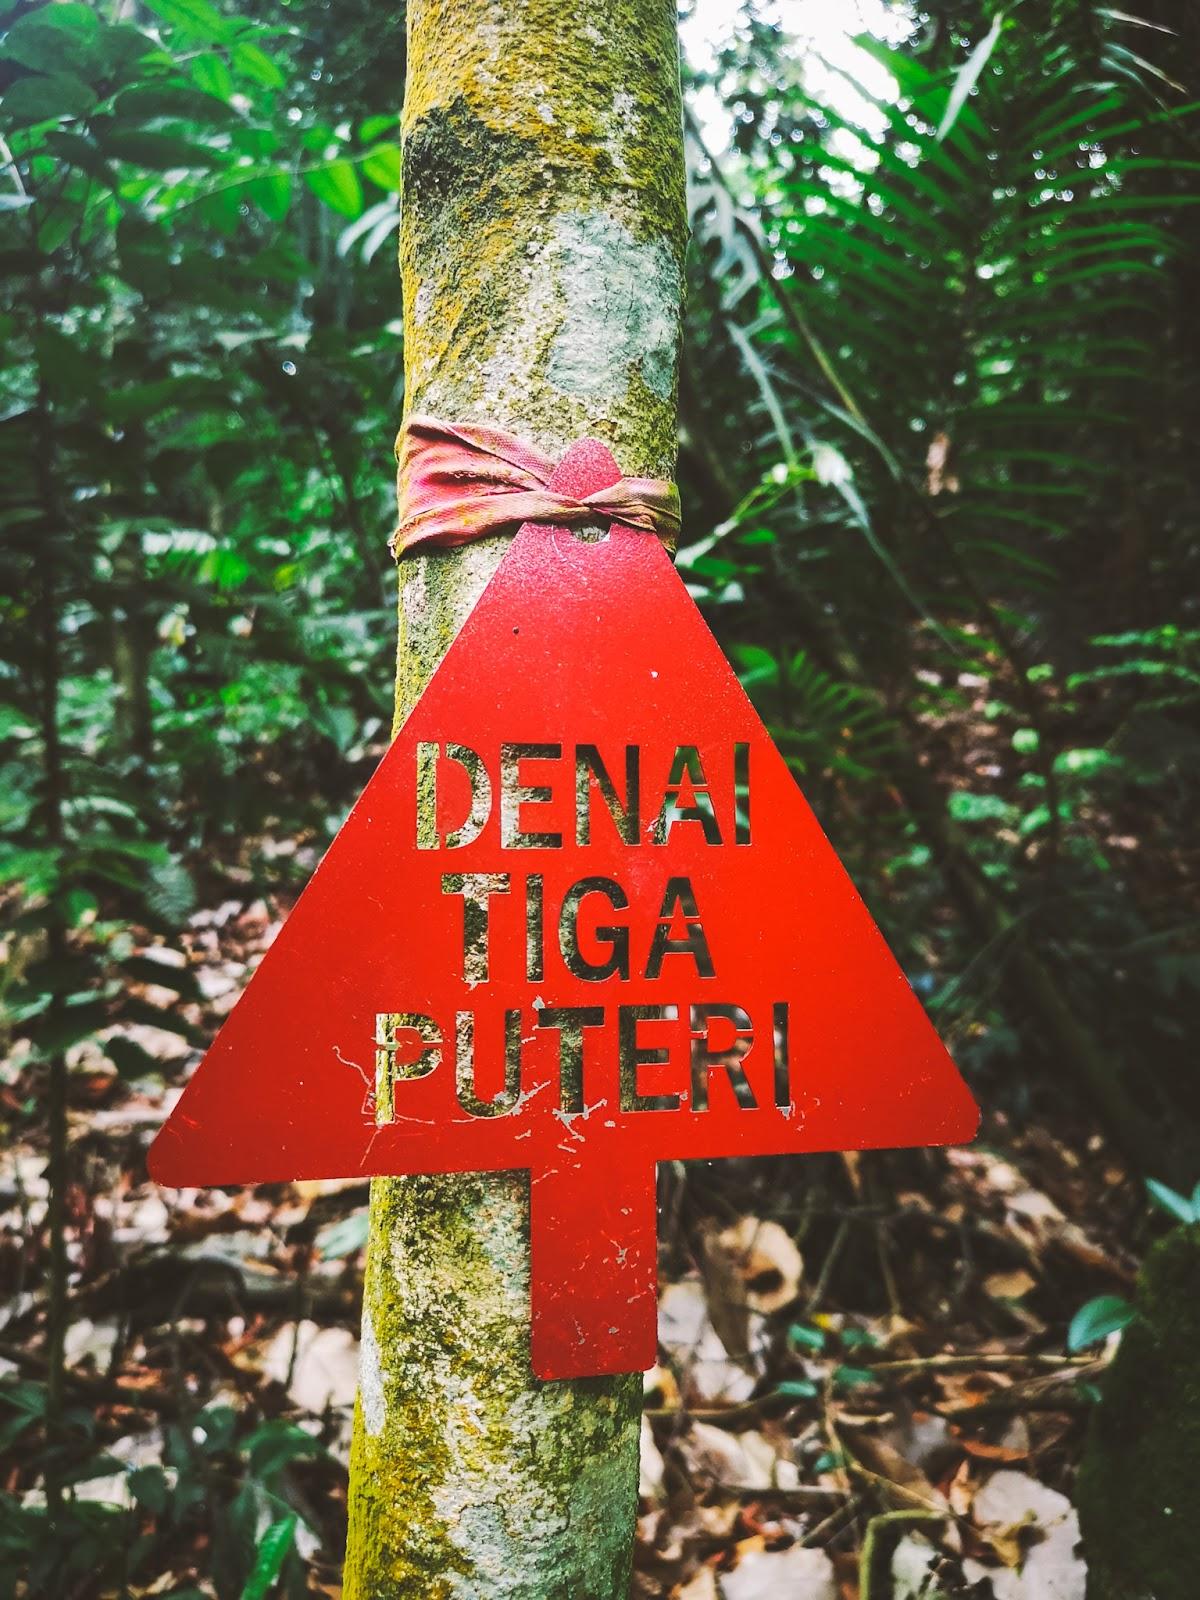 Kota Damansara Community Forest (KDCF) - Denai Tiga Puteri